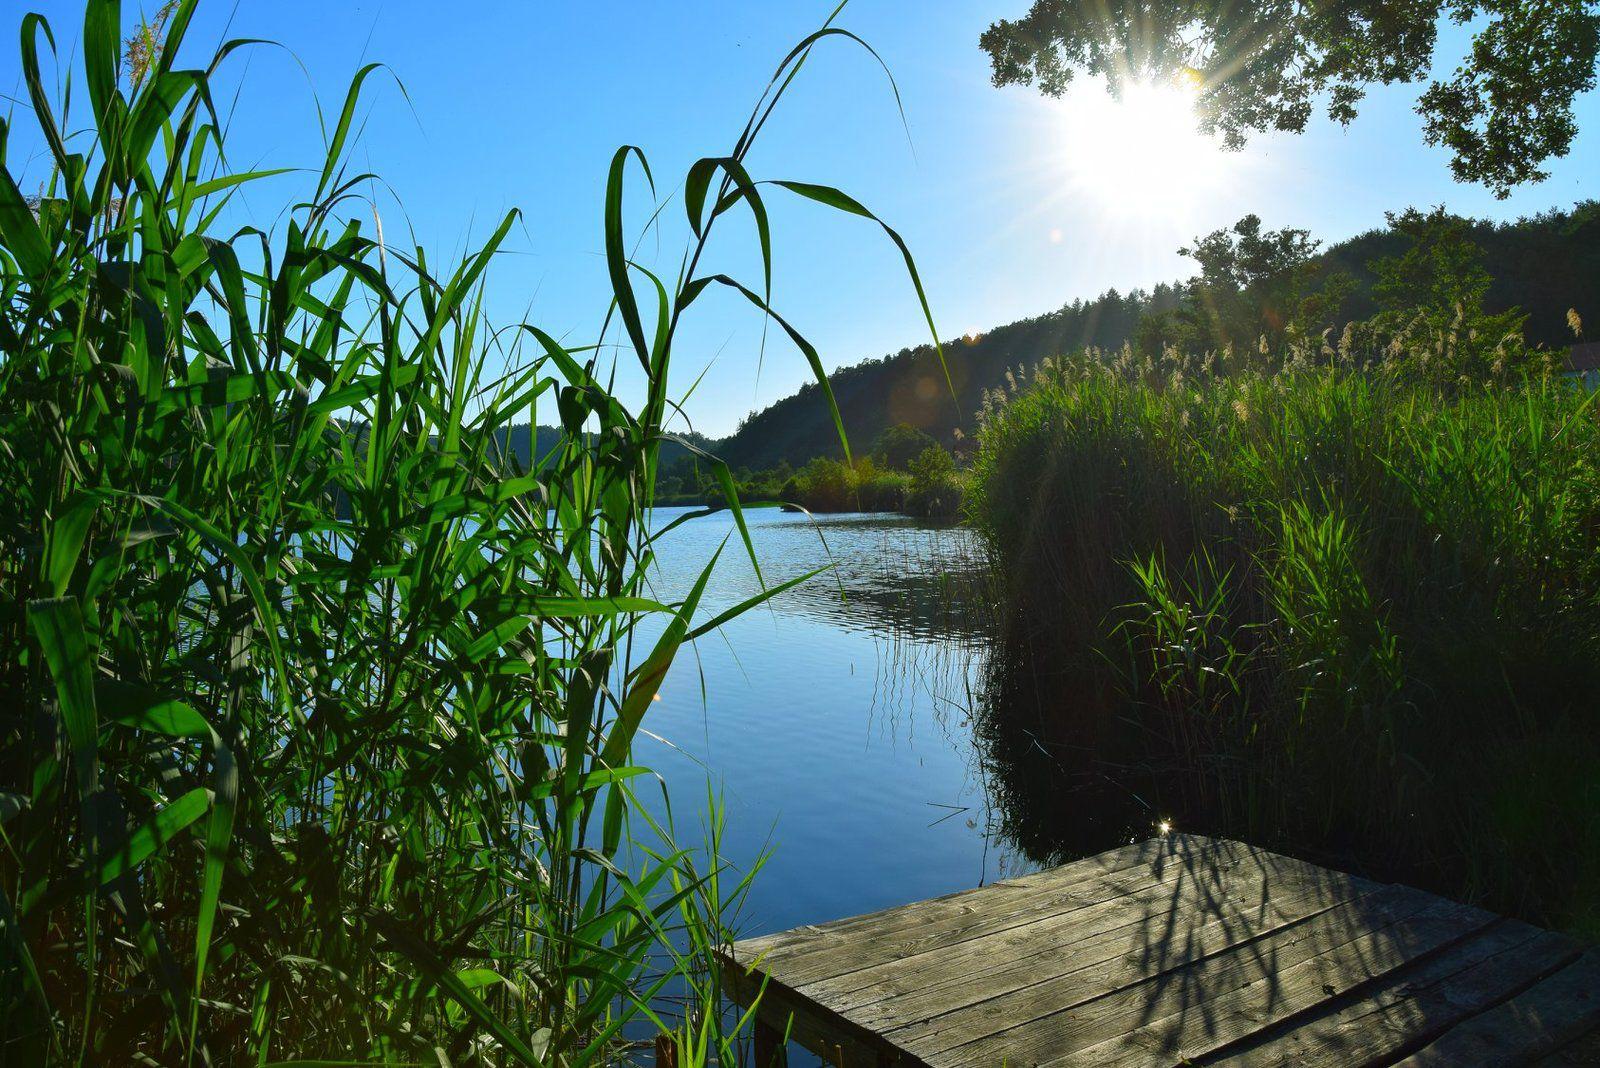 L'étang de Baerenthal